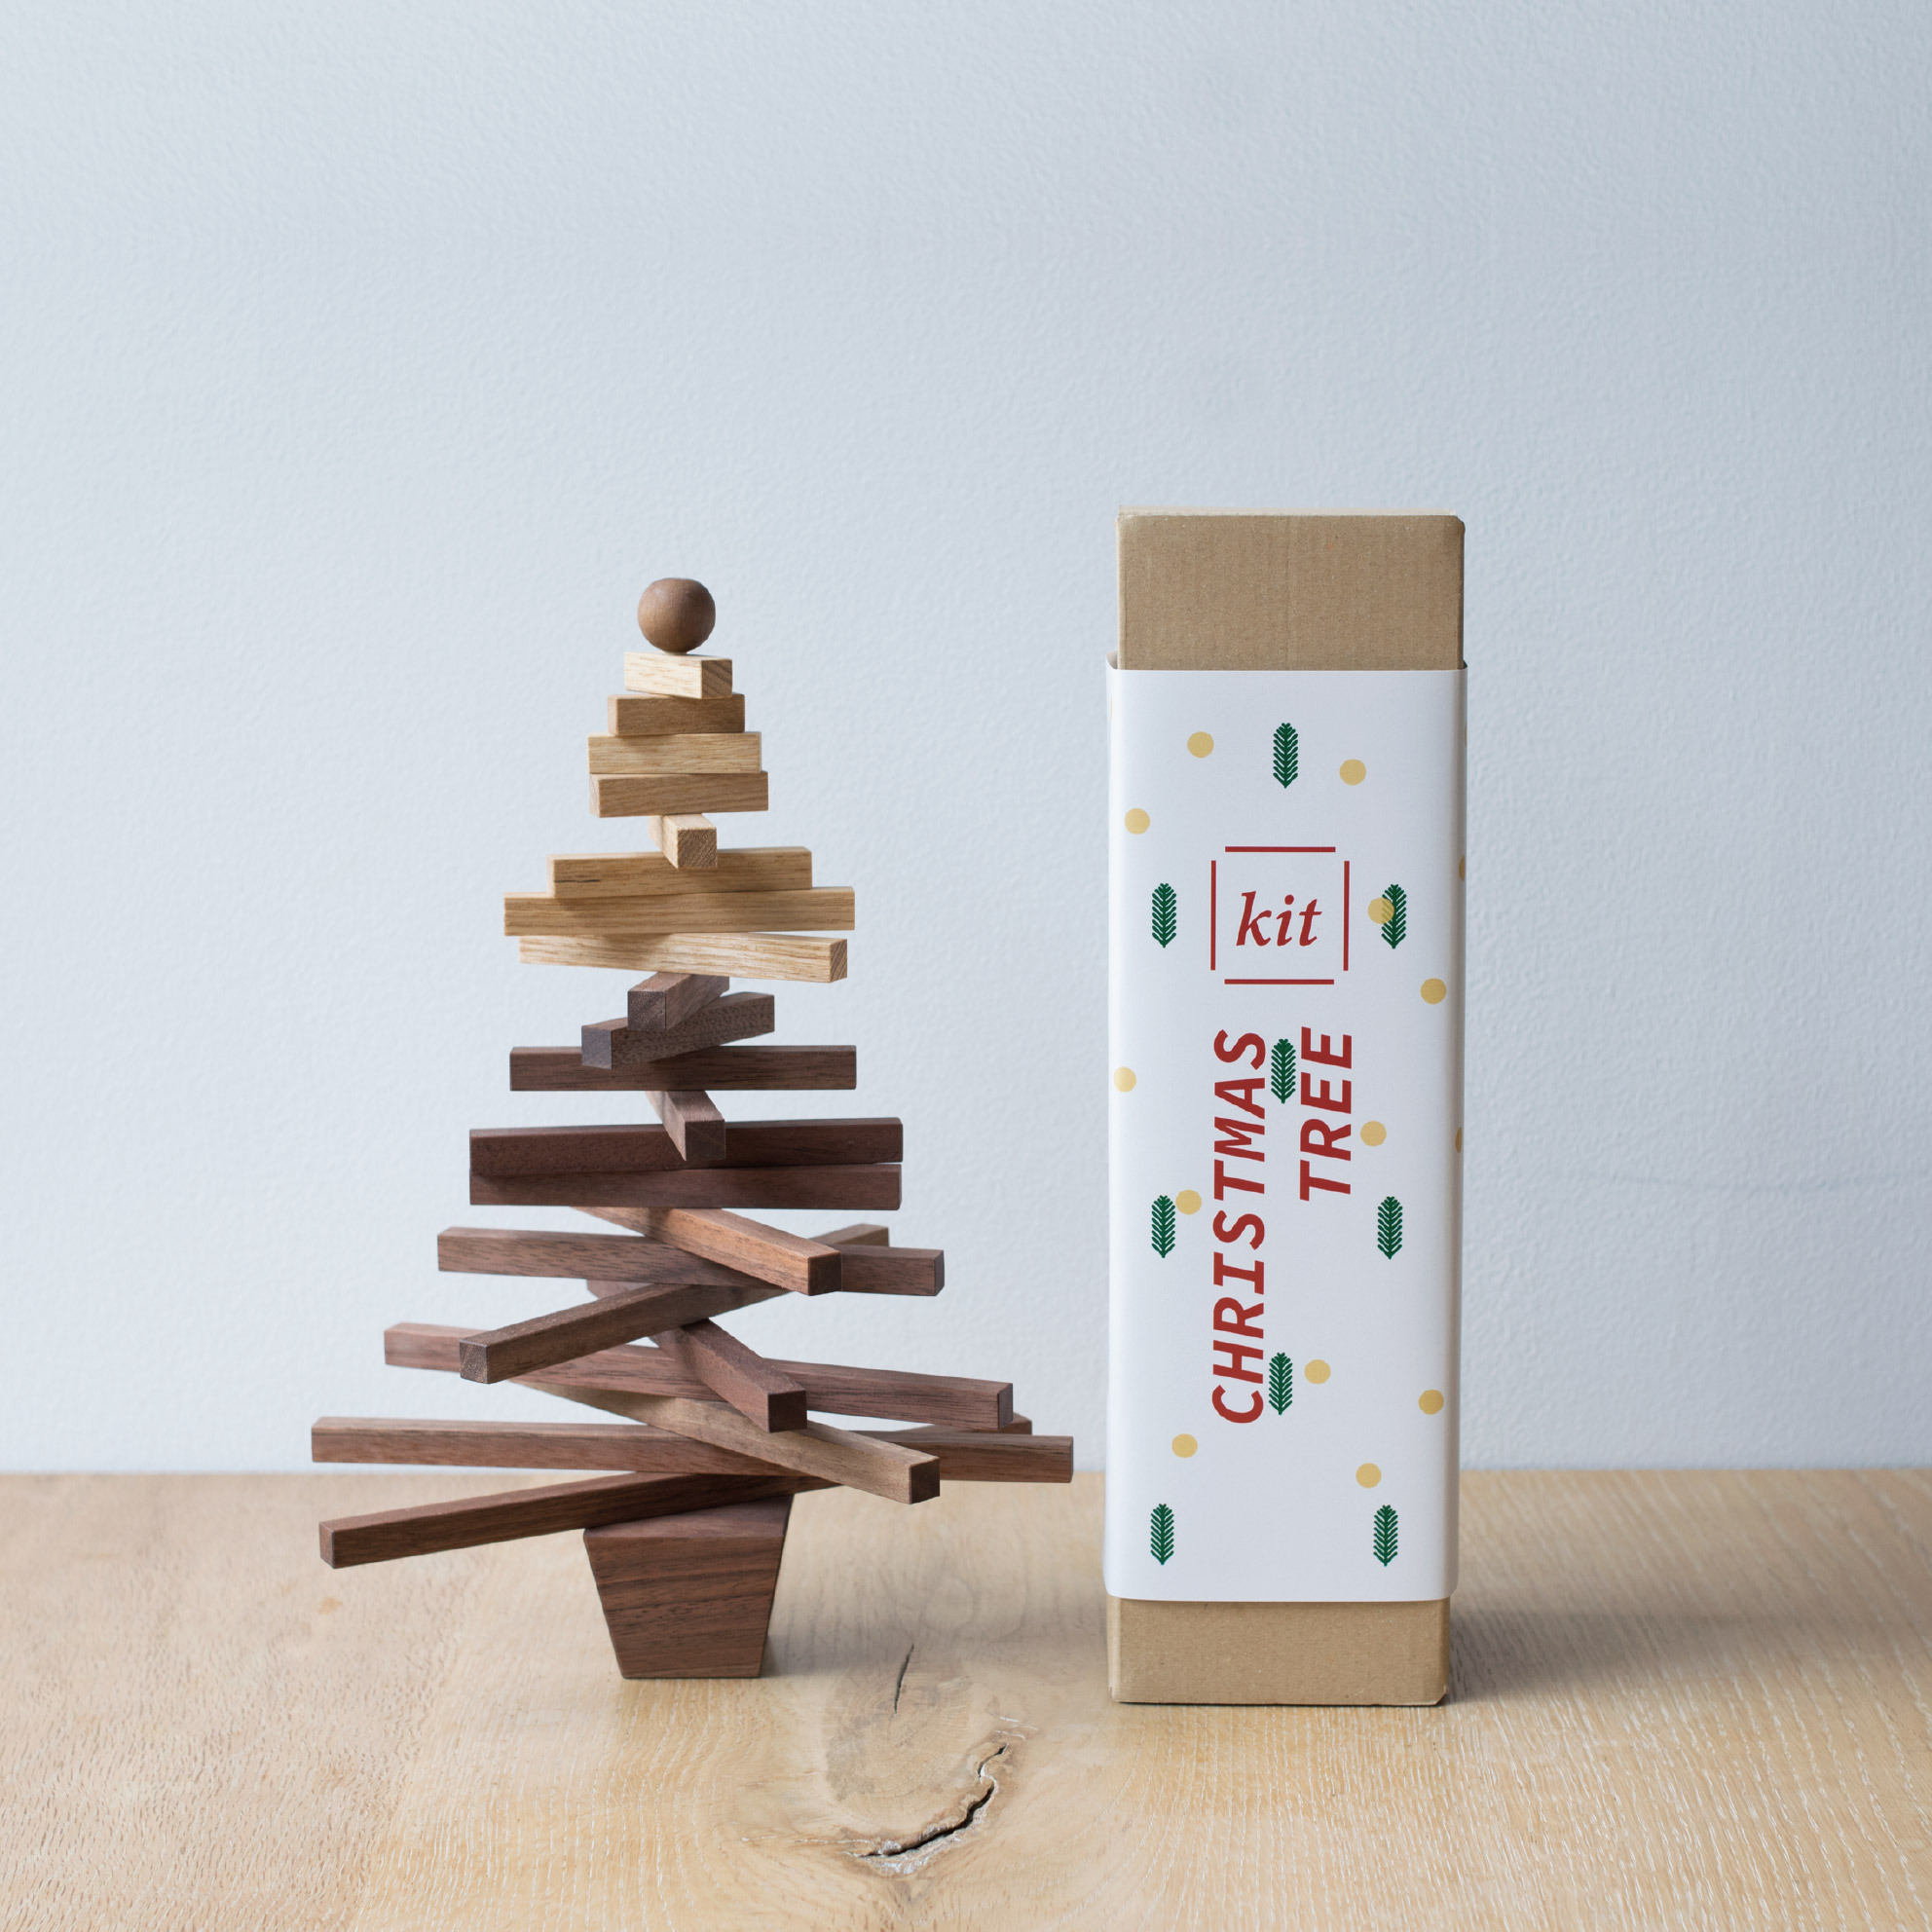 Christmas tree / S KIT (木のクリスマスツリーキット)